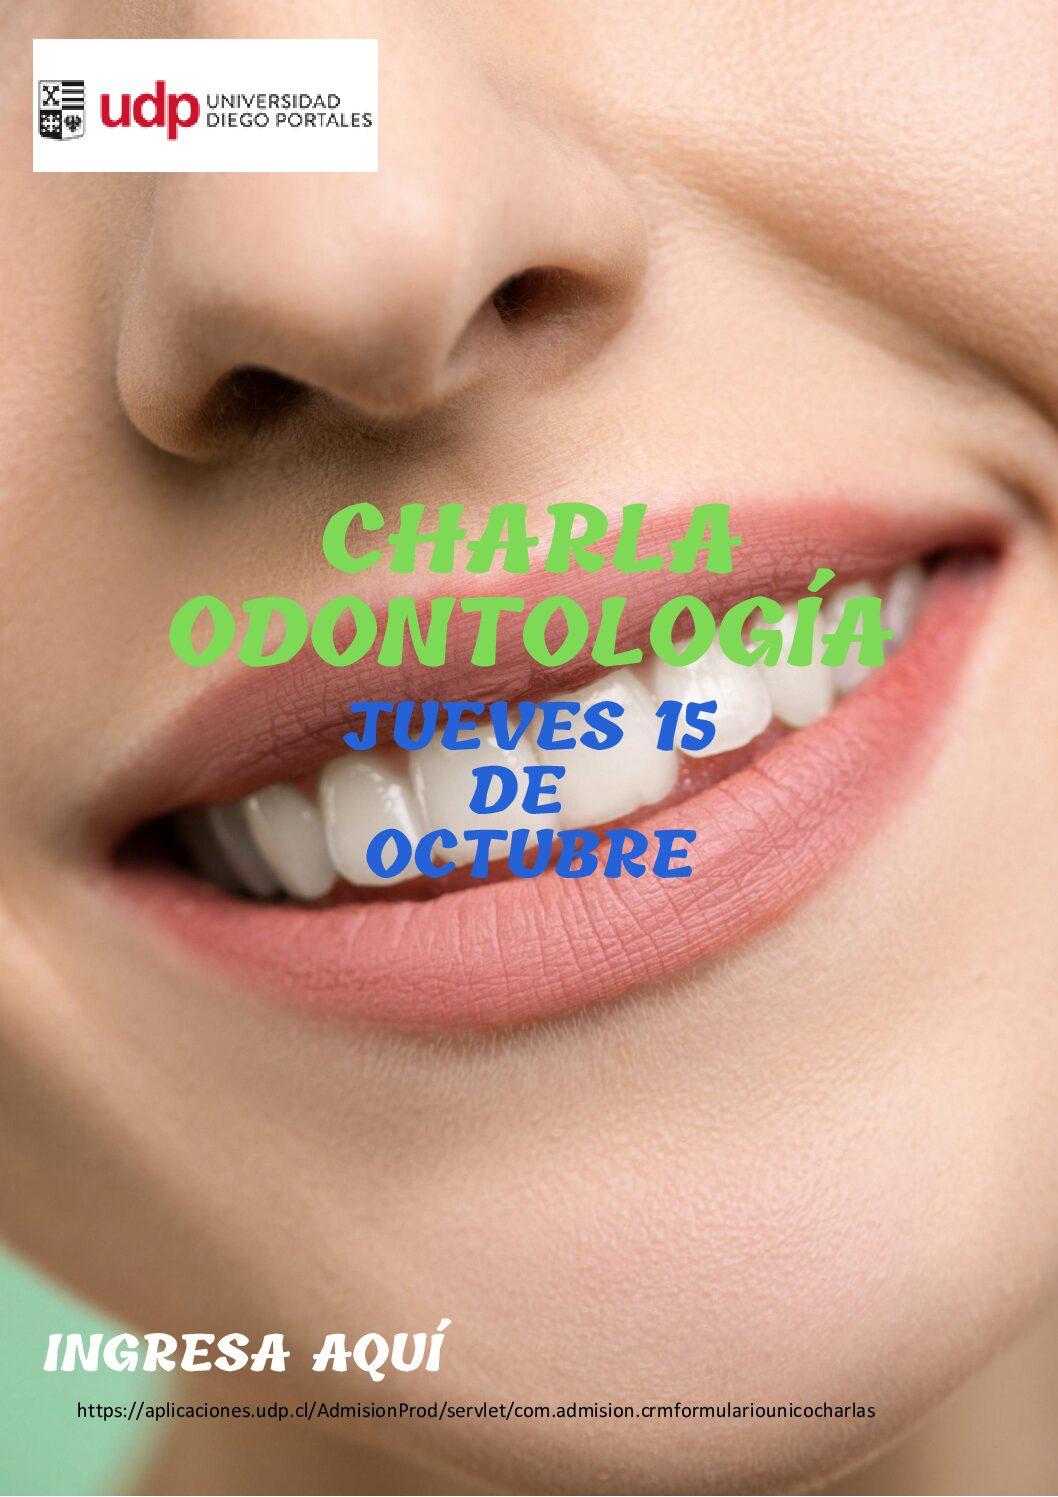 Charla Odontología